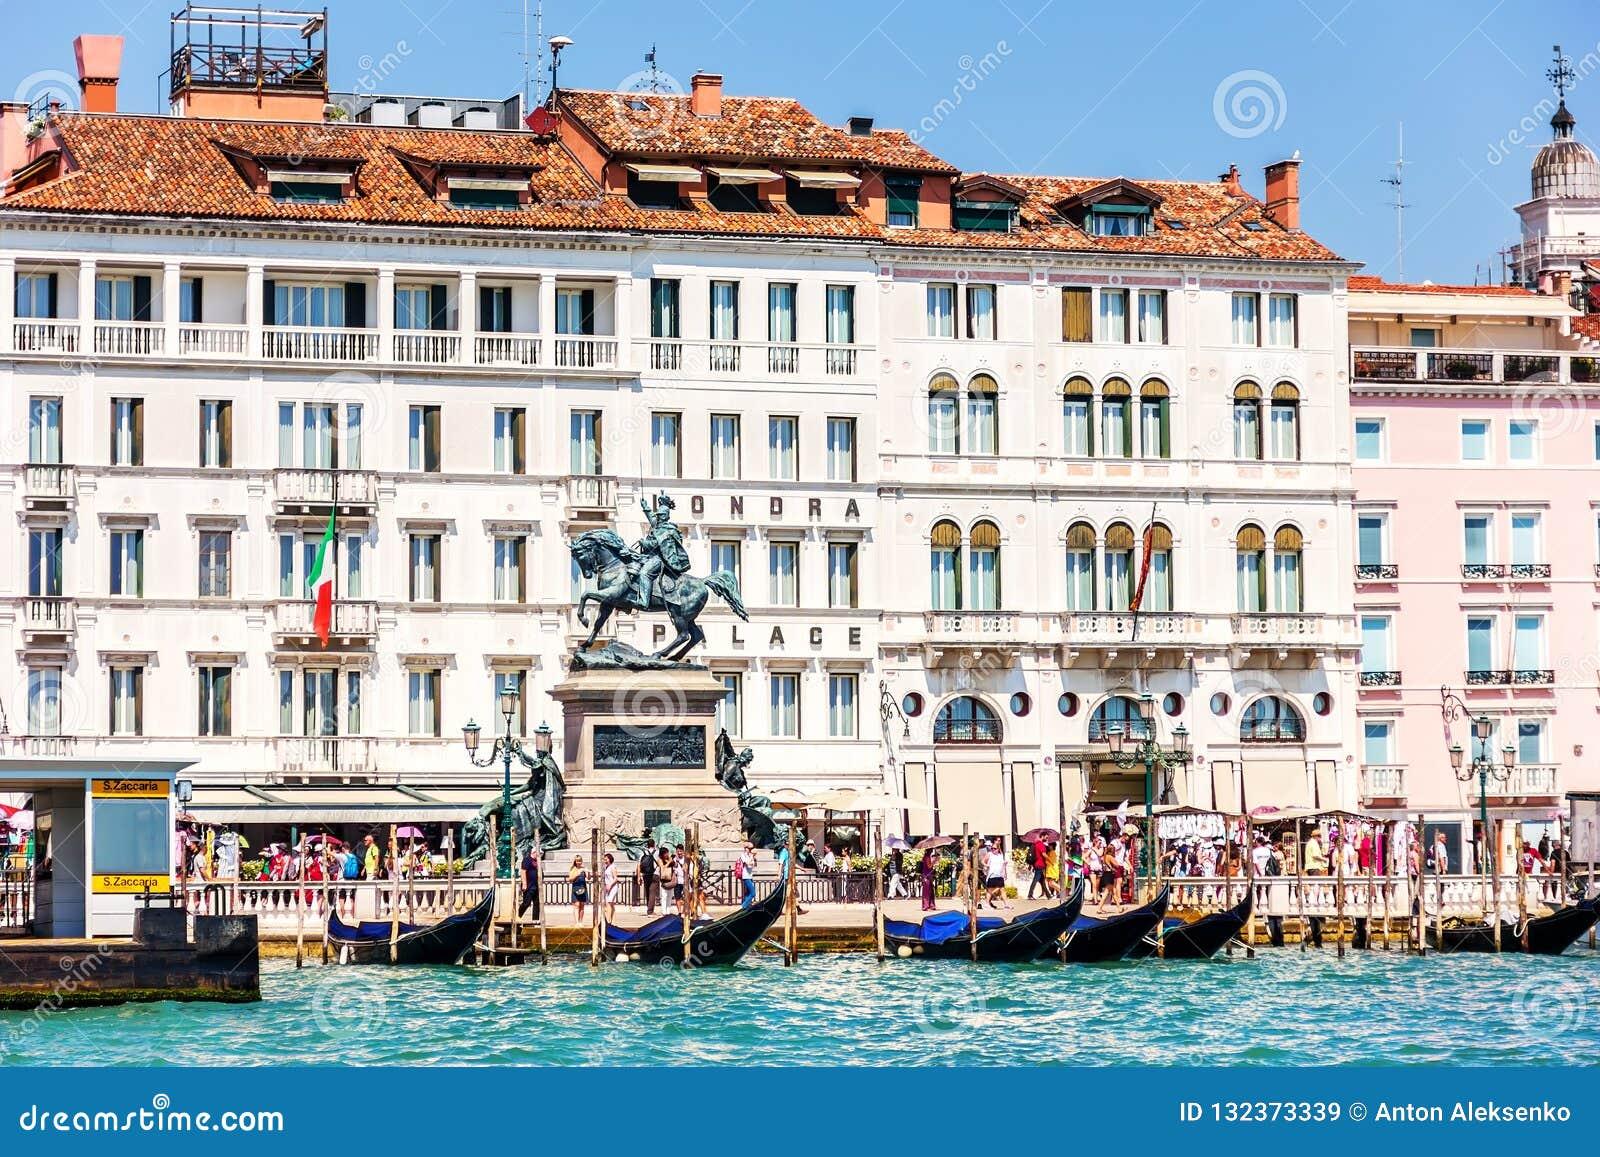 Venetië, Italië - Augustus 22, 2018: Luxueus het Paleisne van hotellondra